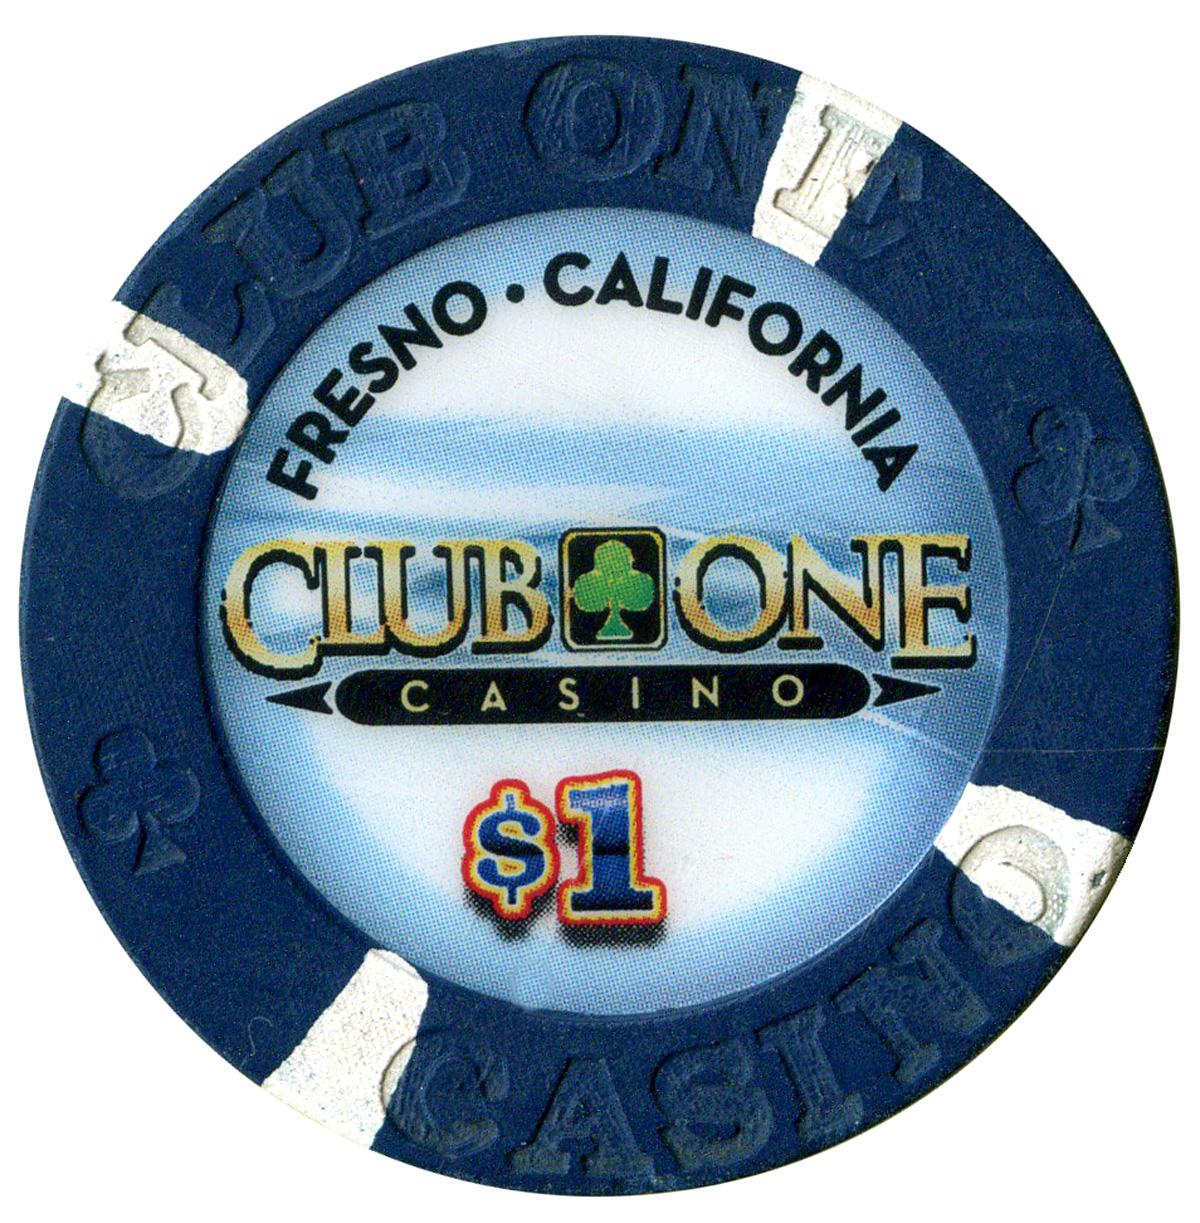 Casino Club One